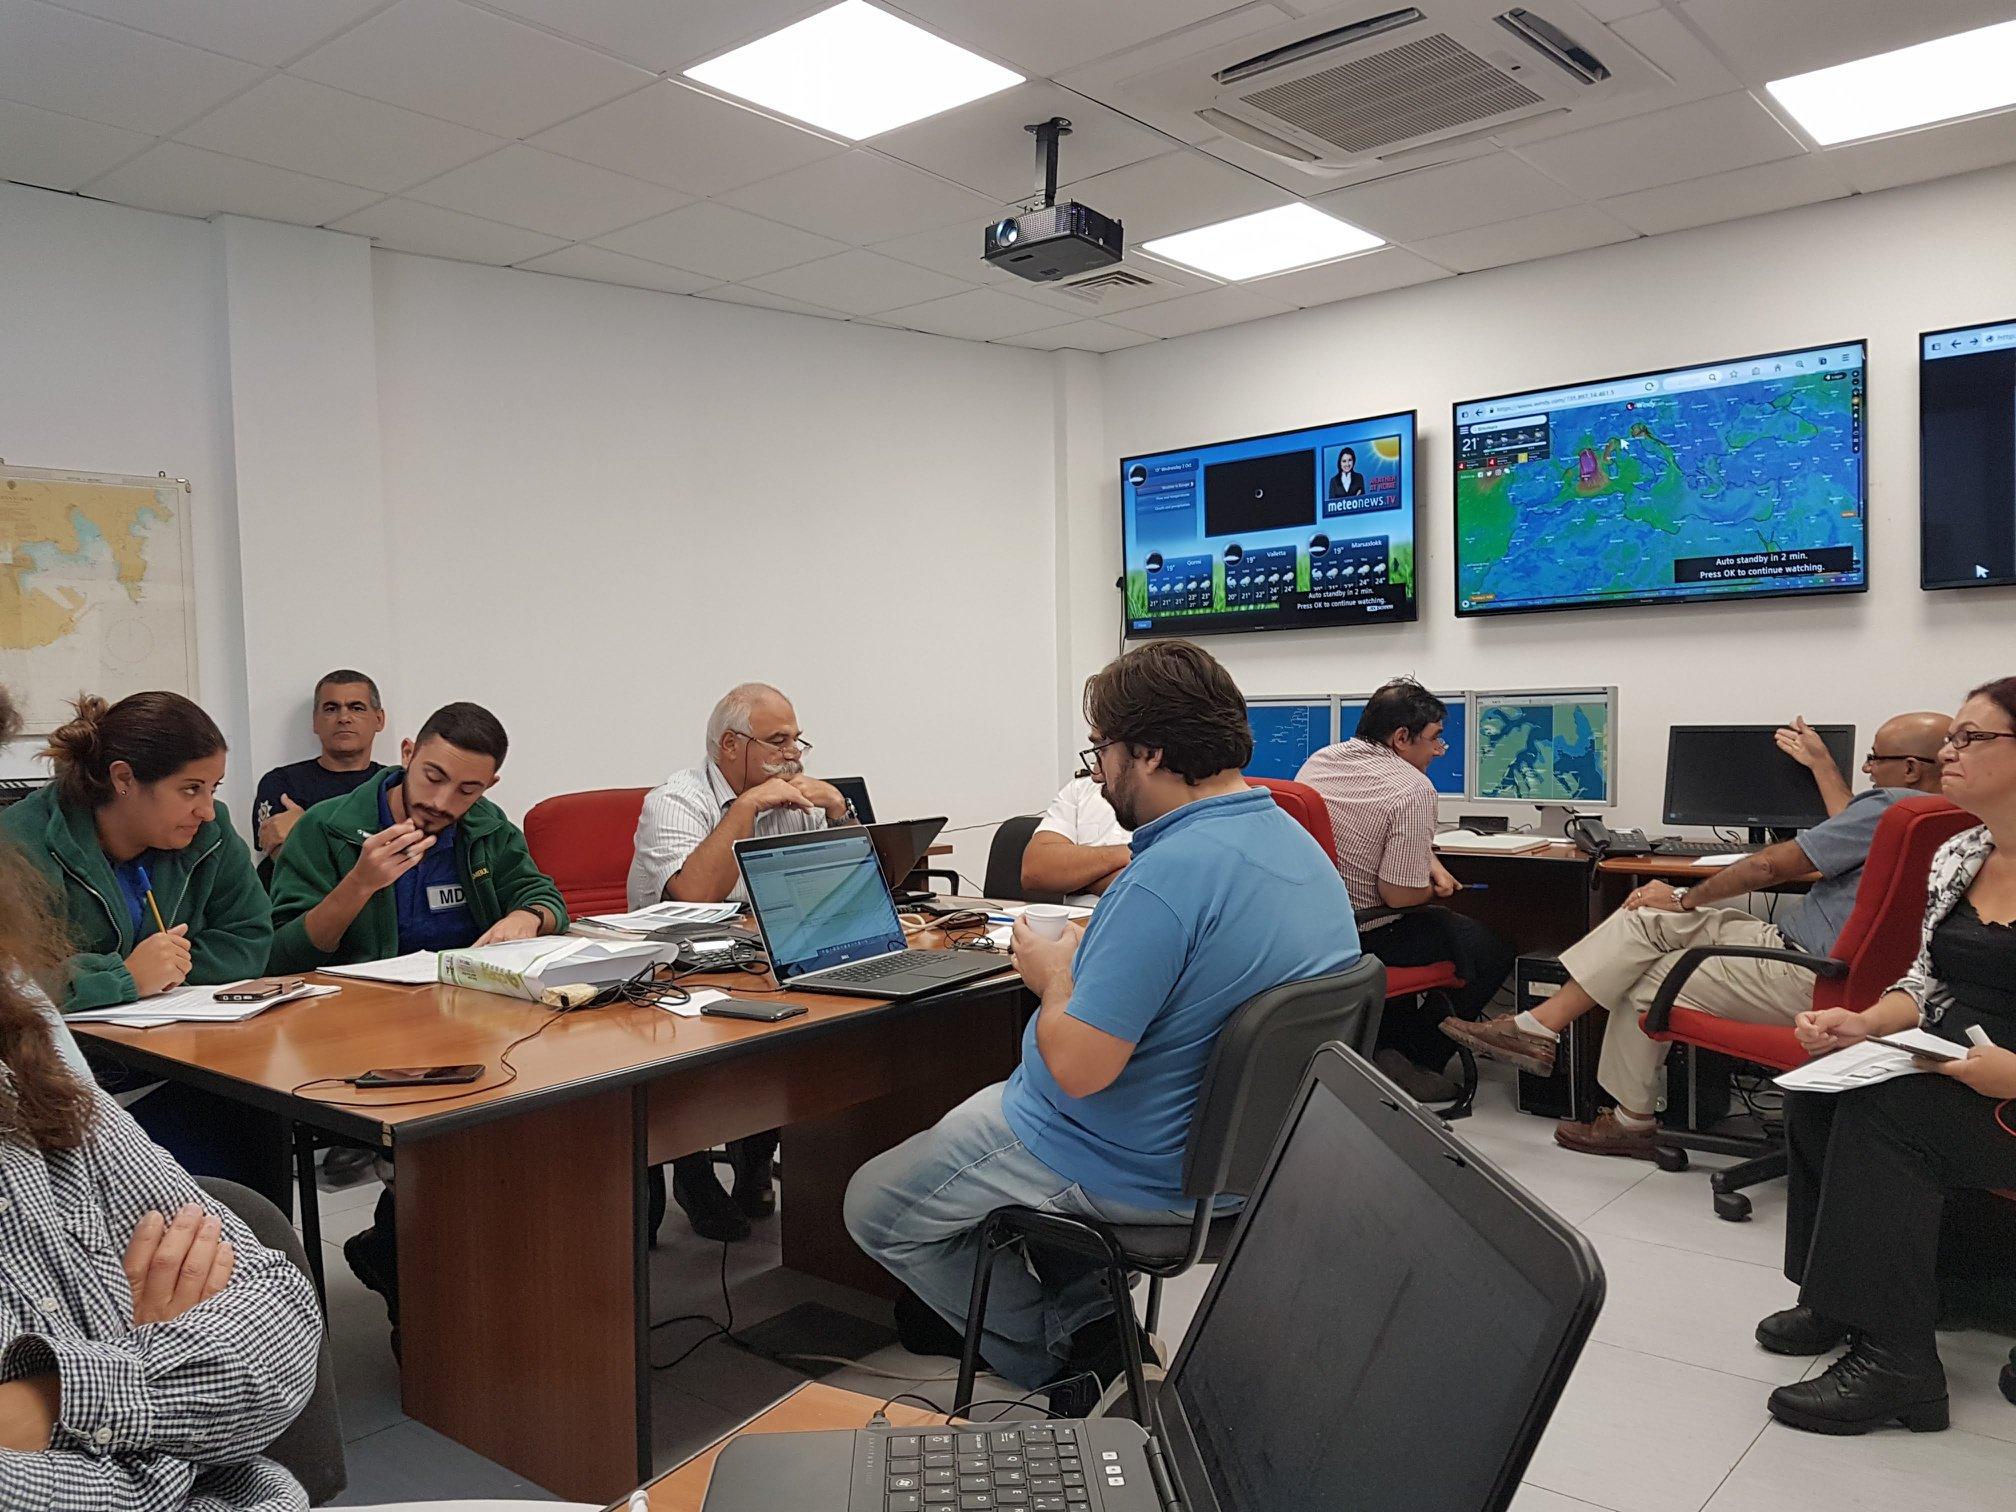 Control Room at Transport Malta premises during Maltex 2018